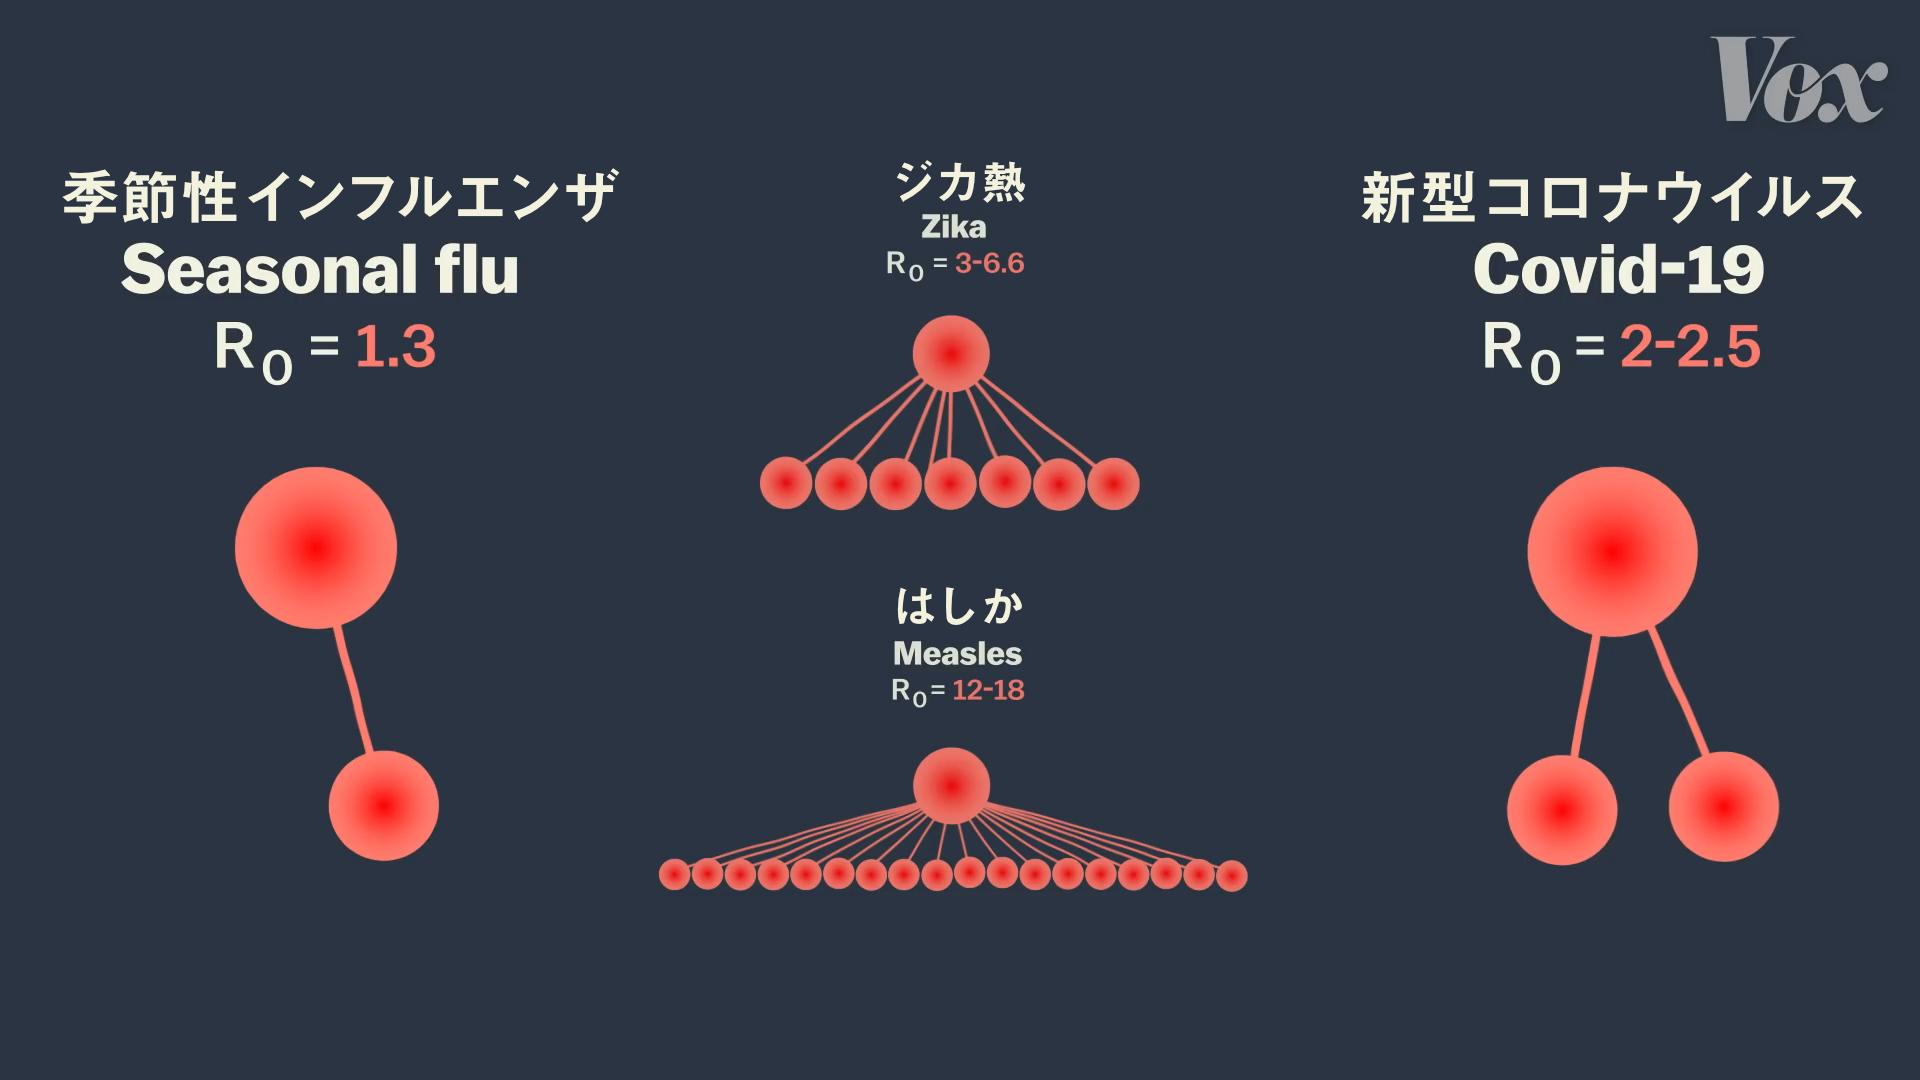 f:id:Imamura:20200408175052p:plain